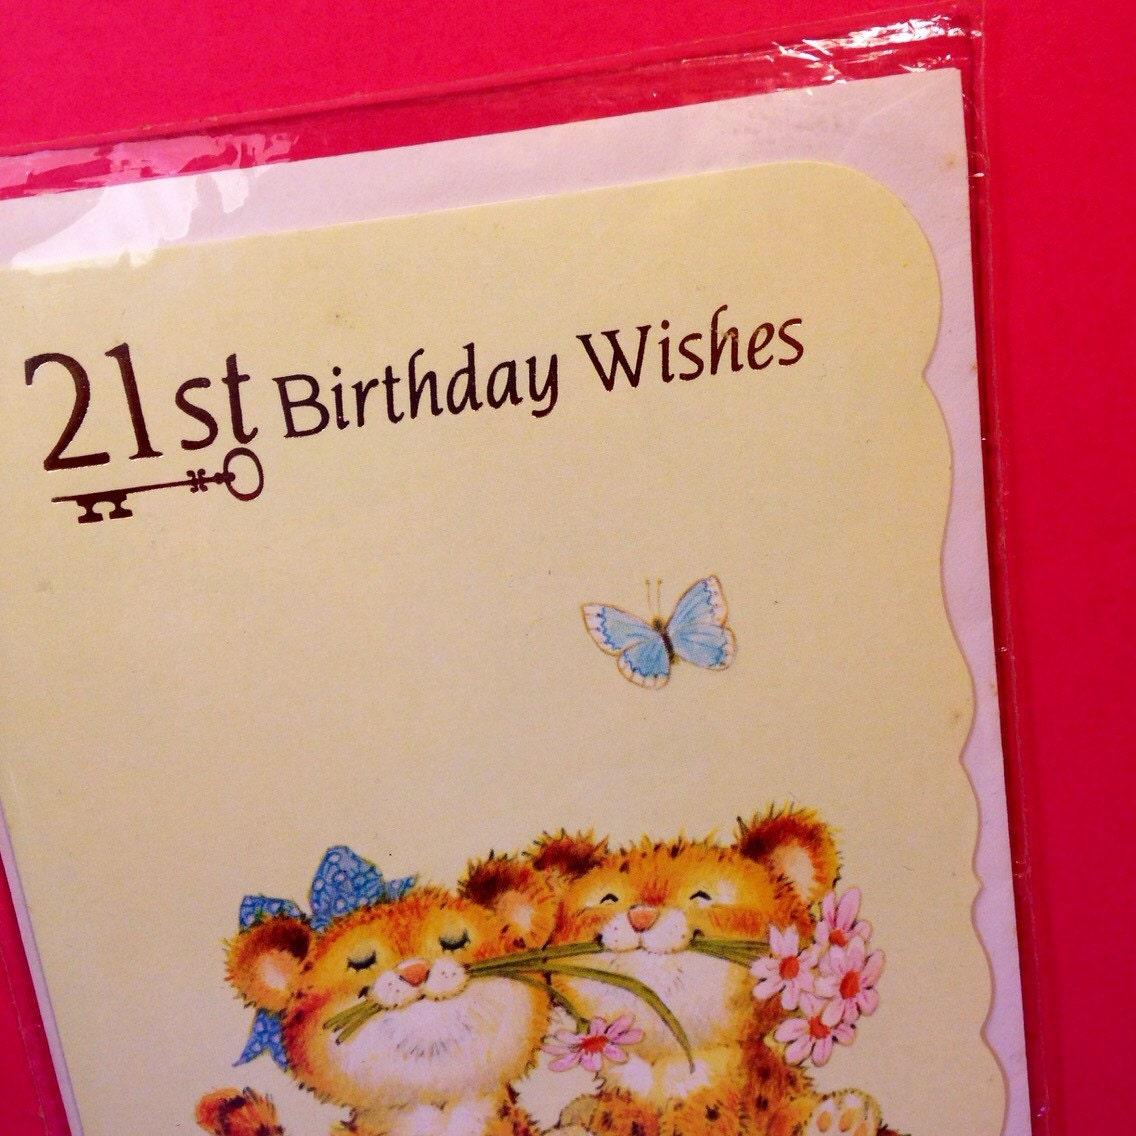 21st birthday card vintage birthday card 21st birthday wishes 21st birthday card vintage birthday card 21st birthday wishes vintage greeting card kristyandbryce Images